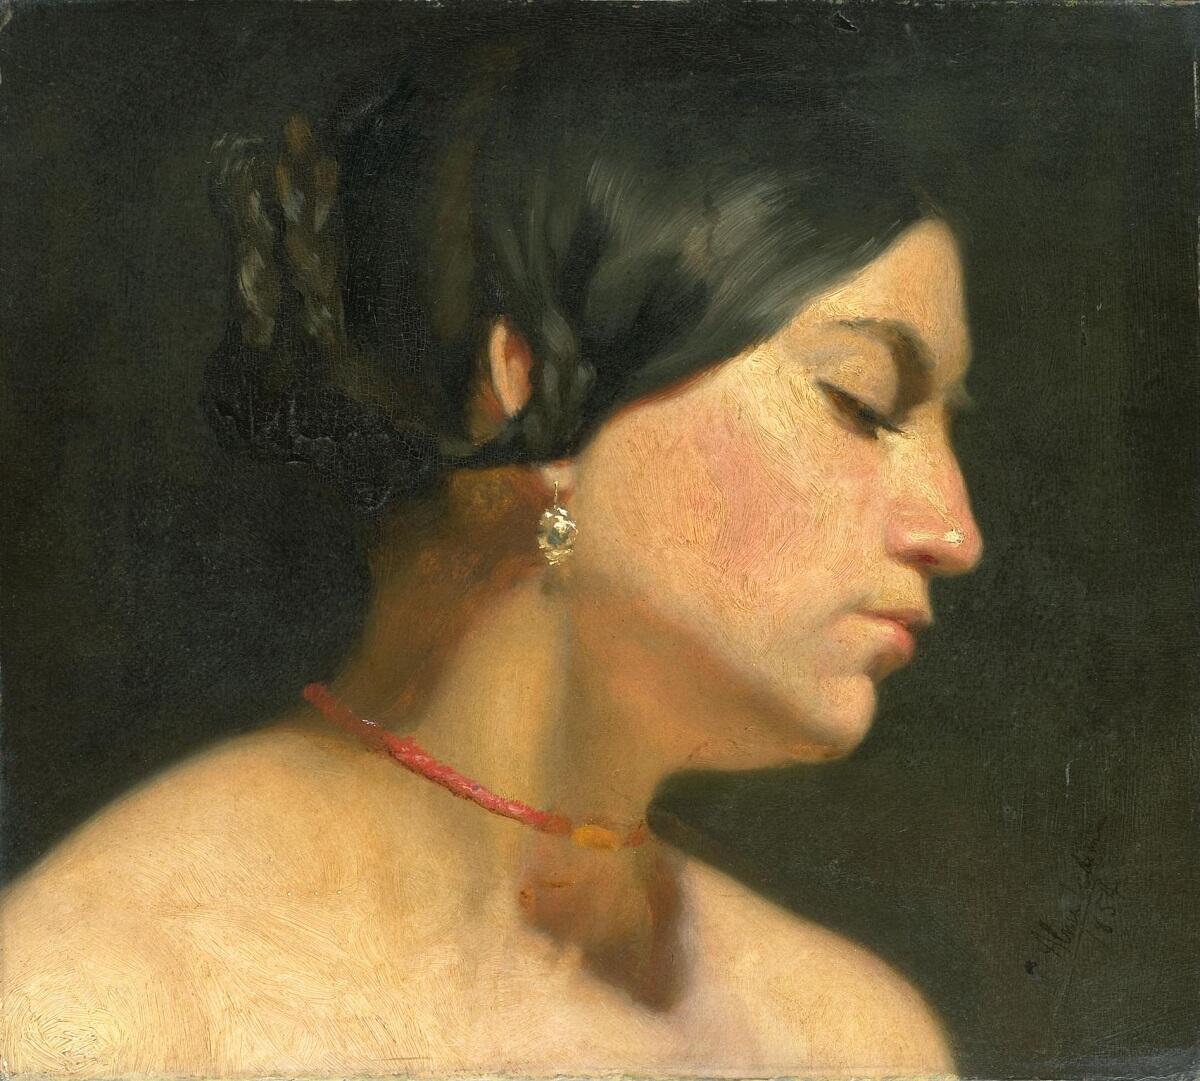 Альма-Тадема сэр Лоуренс, Мария Магдалина, 1854, 31х 35 см, Rijksmuseum, Амстердам, Нидерланды